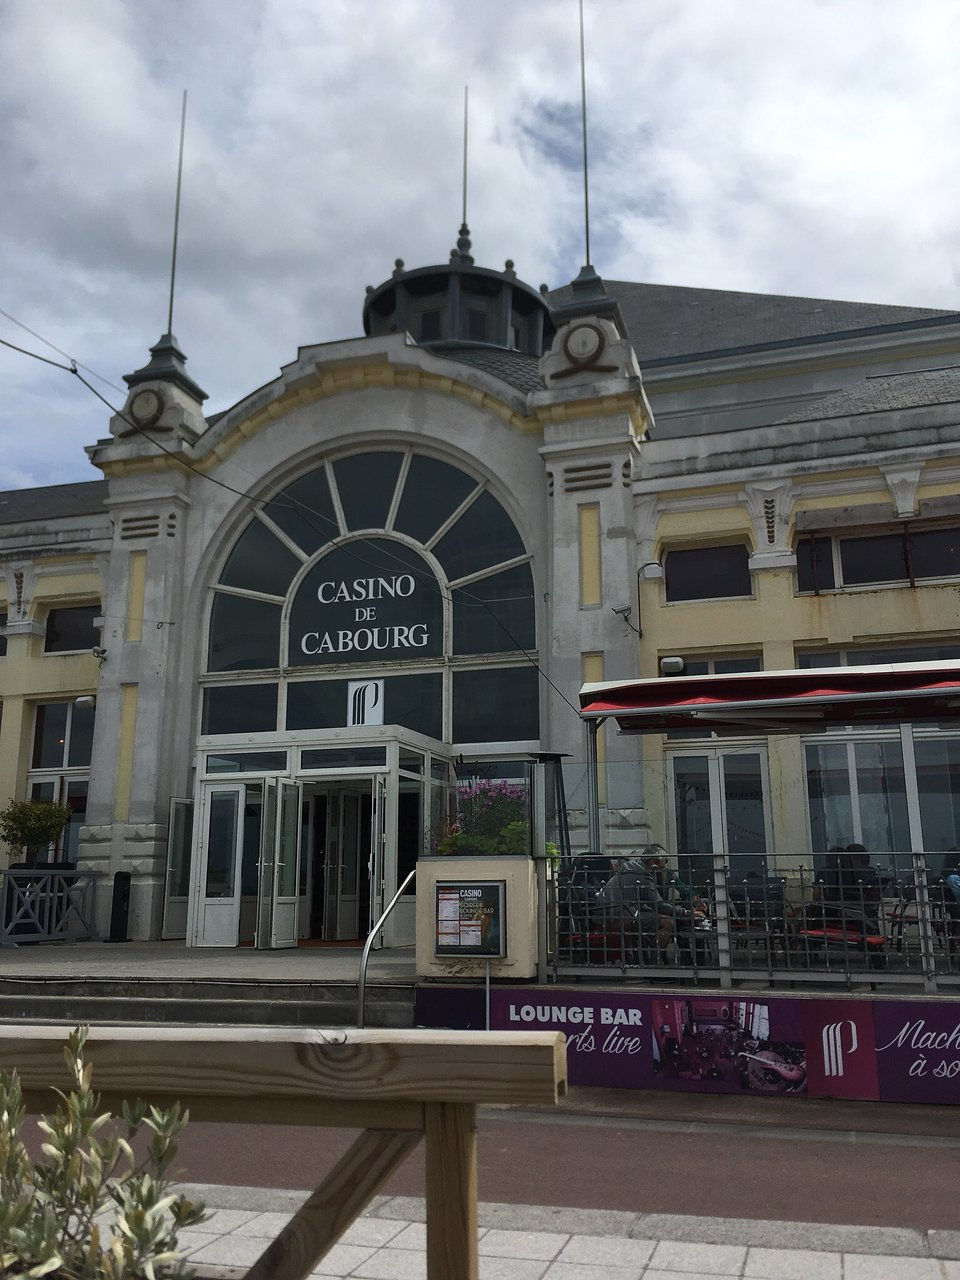 Casino cabourg poker hollywood casino baton rouge restaurant